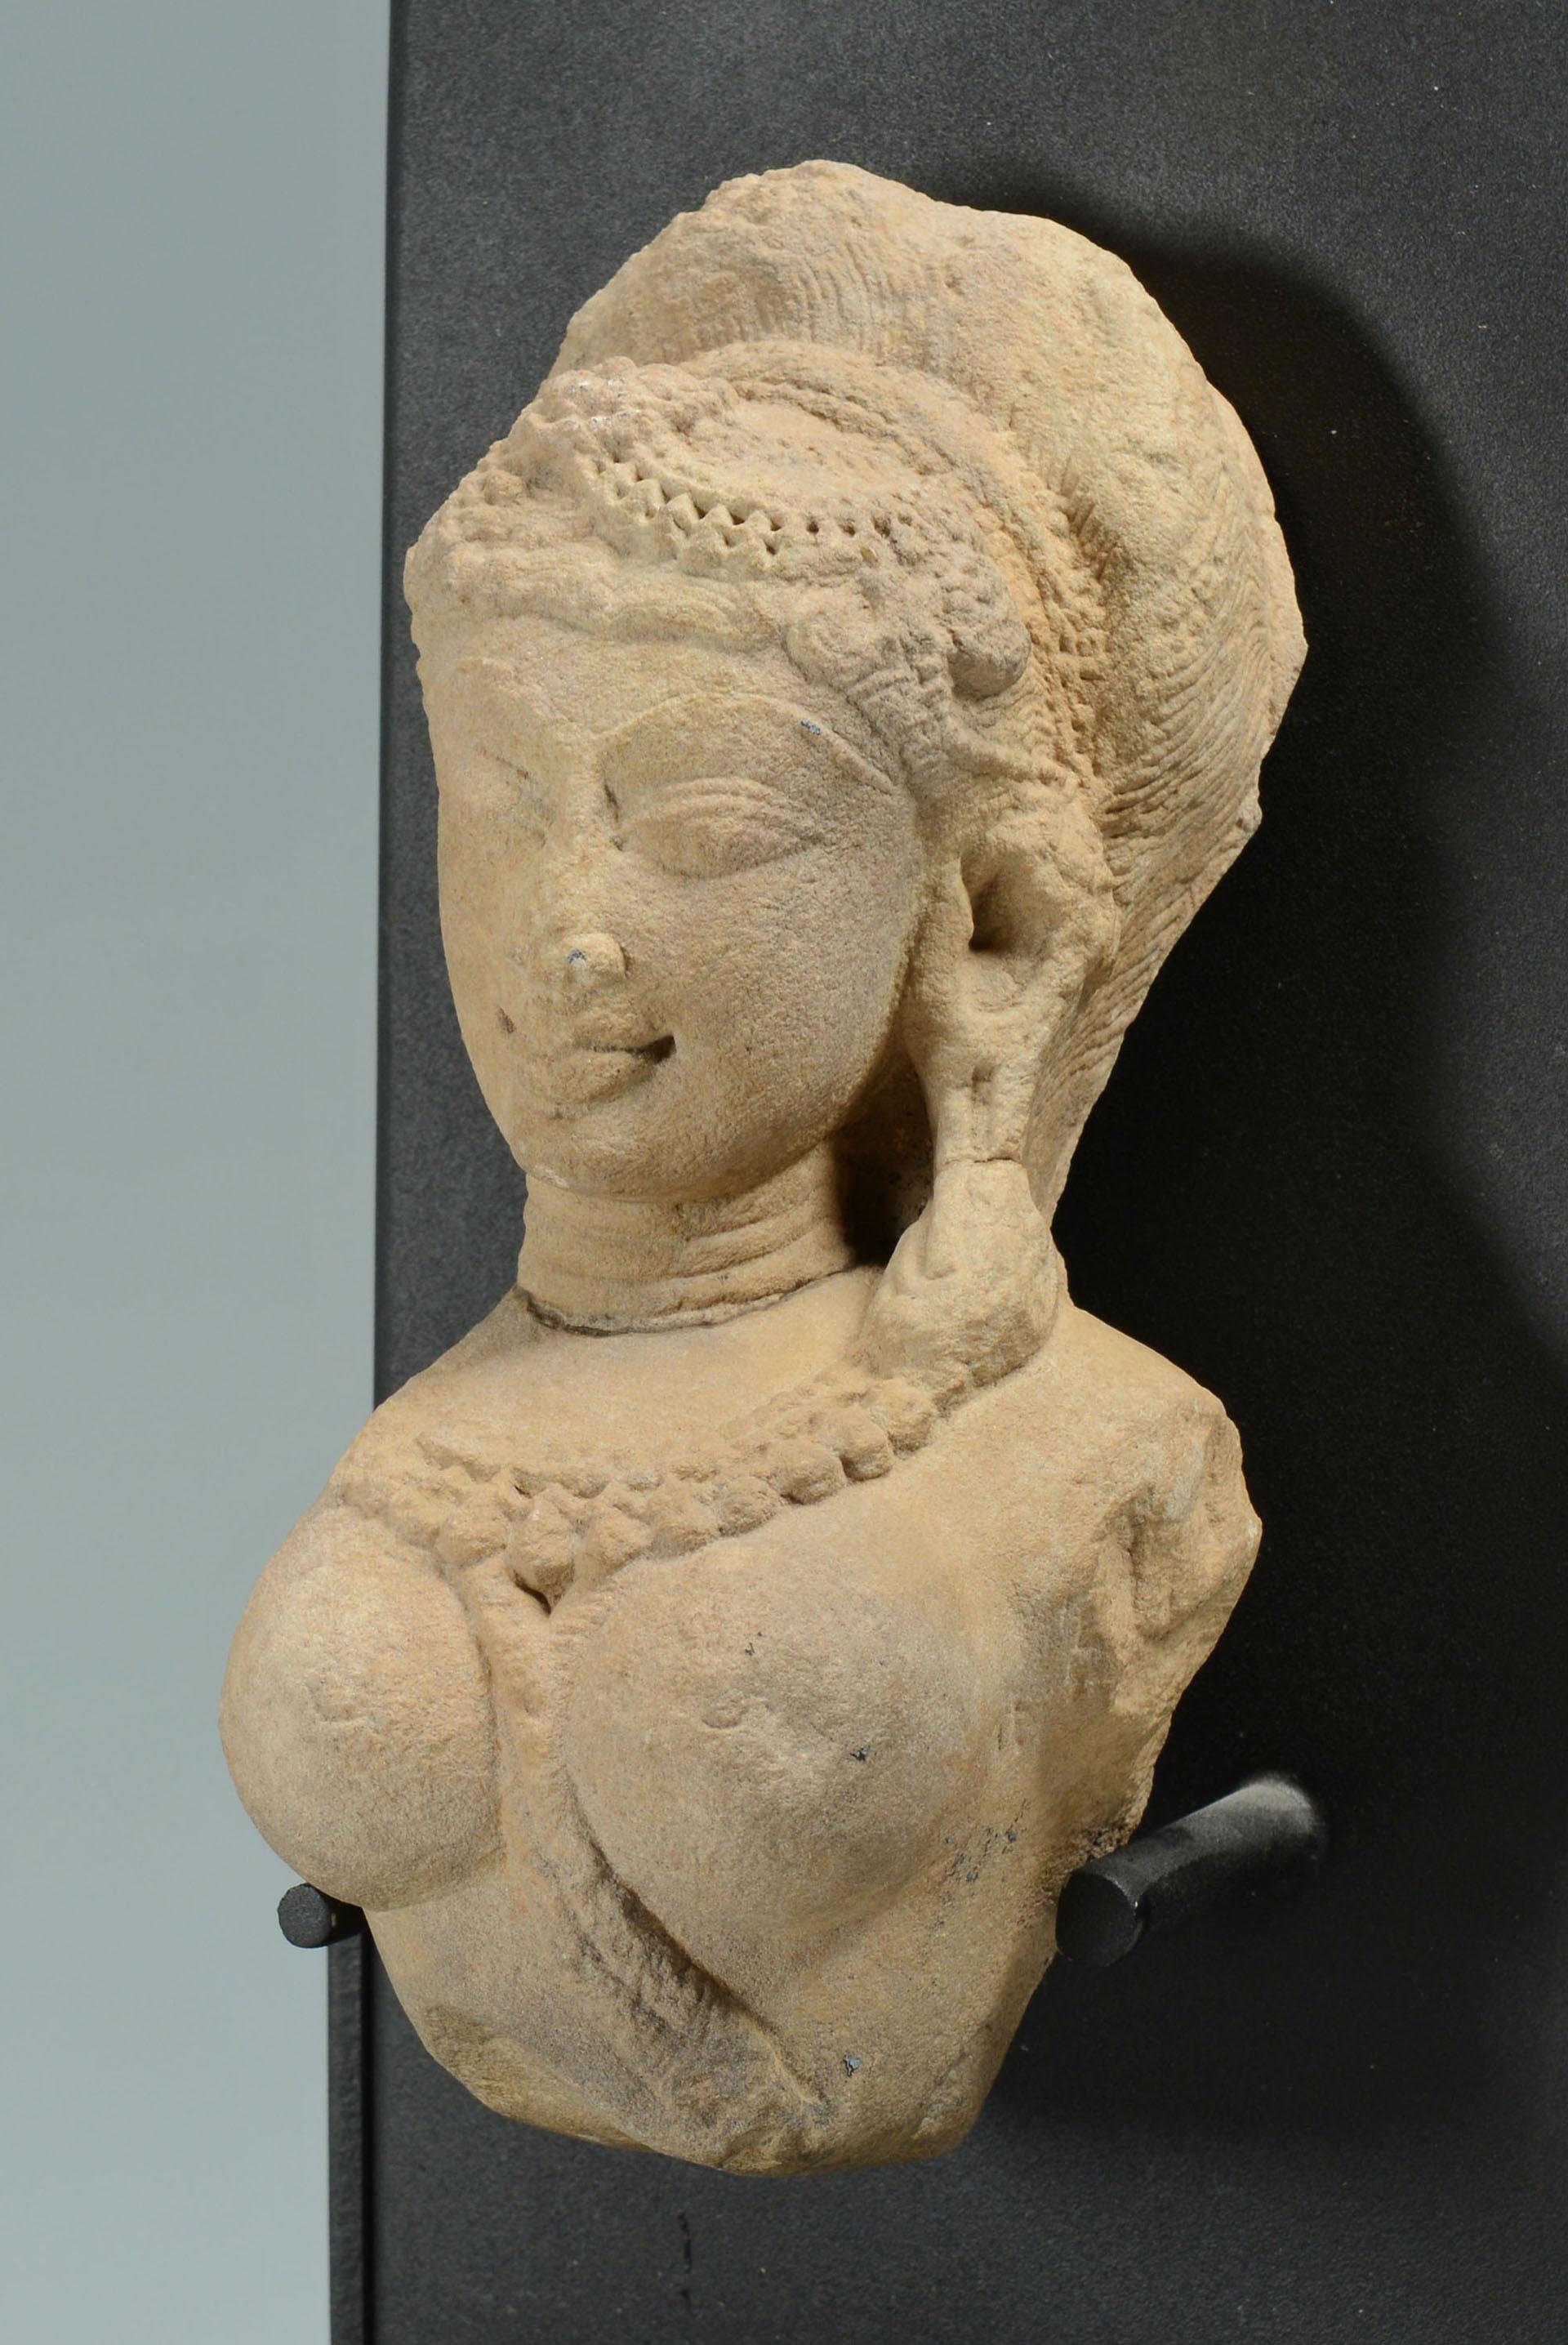 Hindu goddess stone temple carving